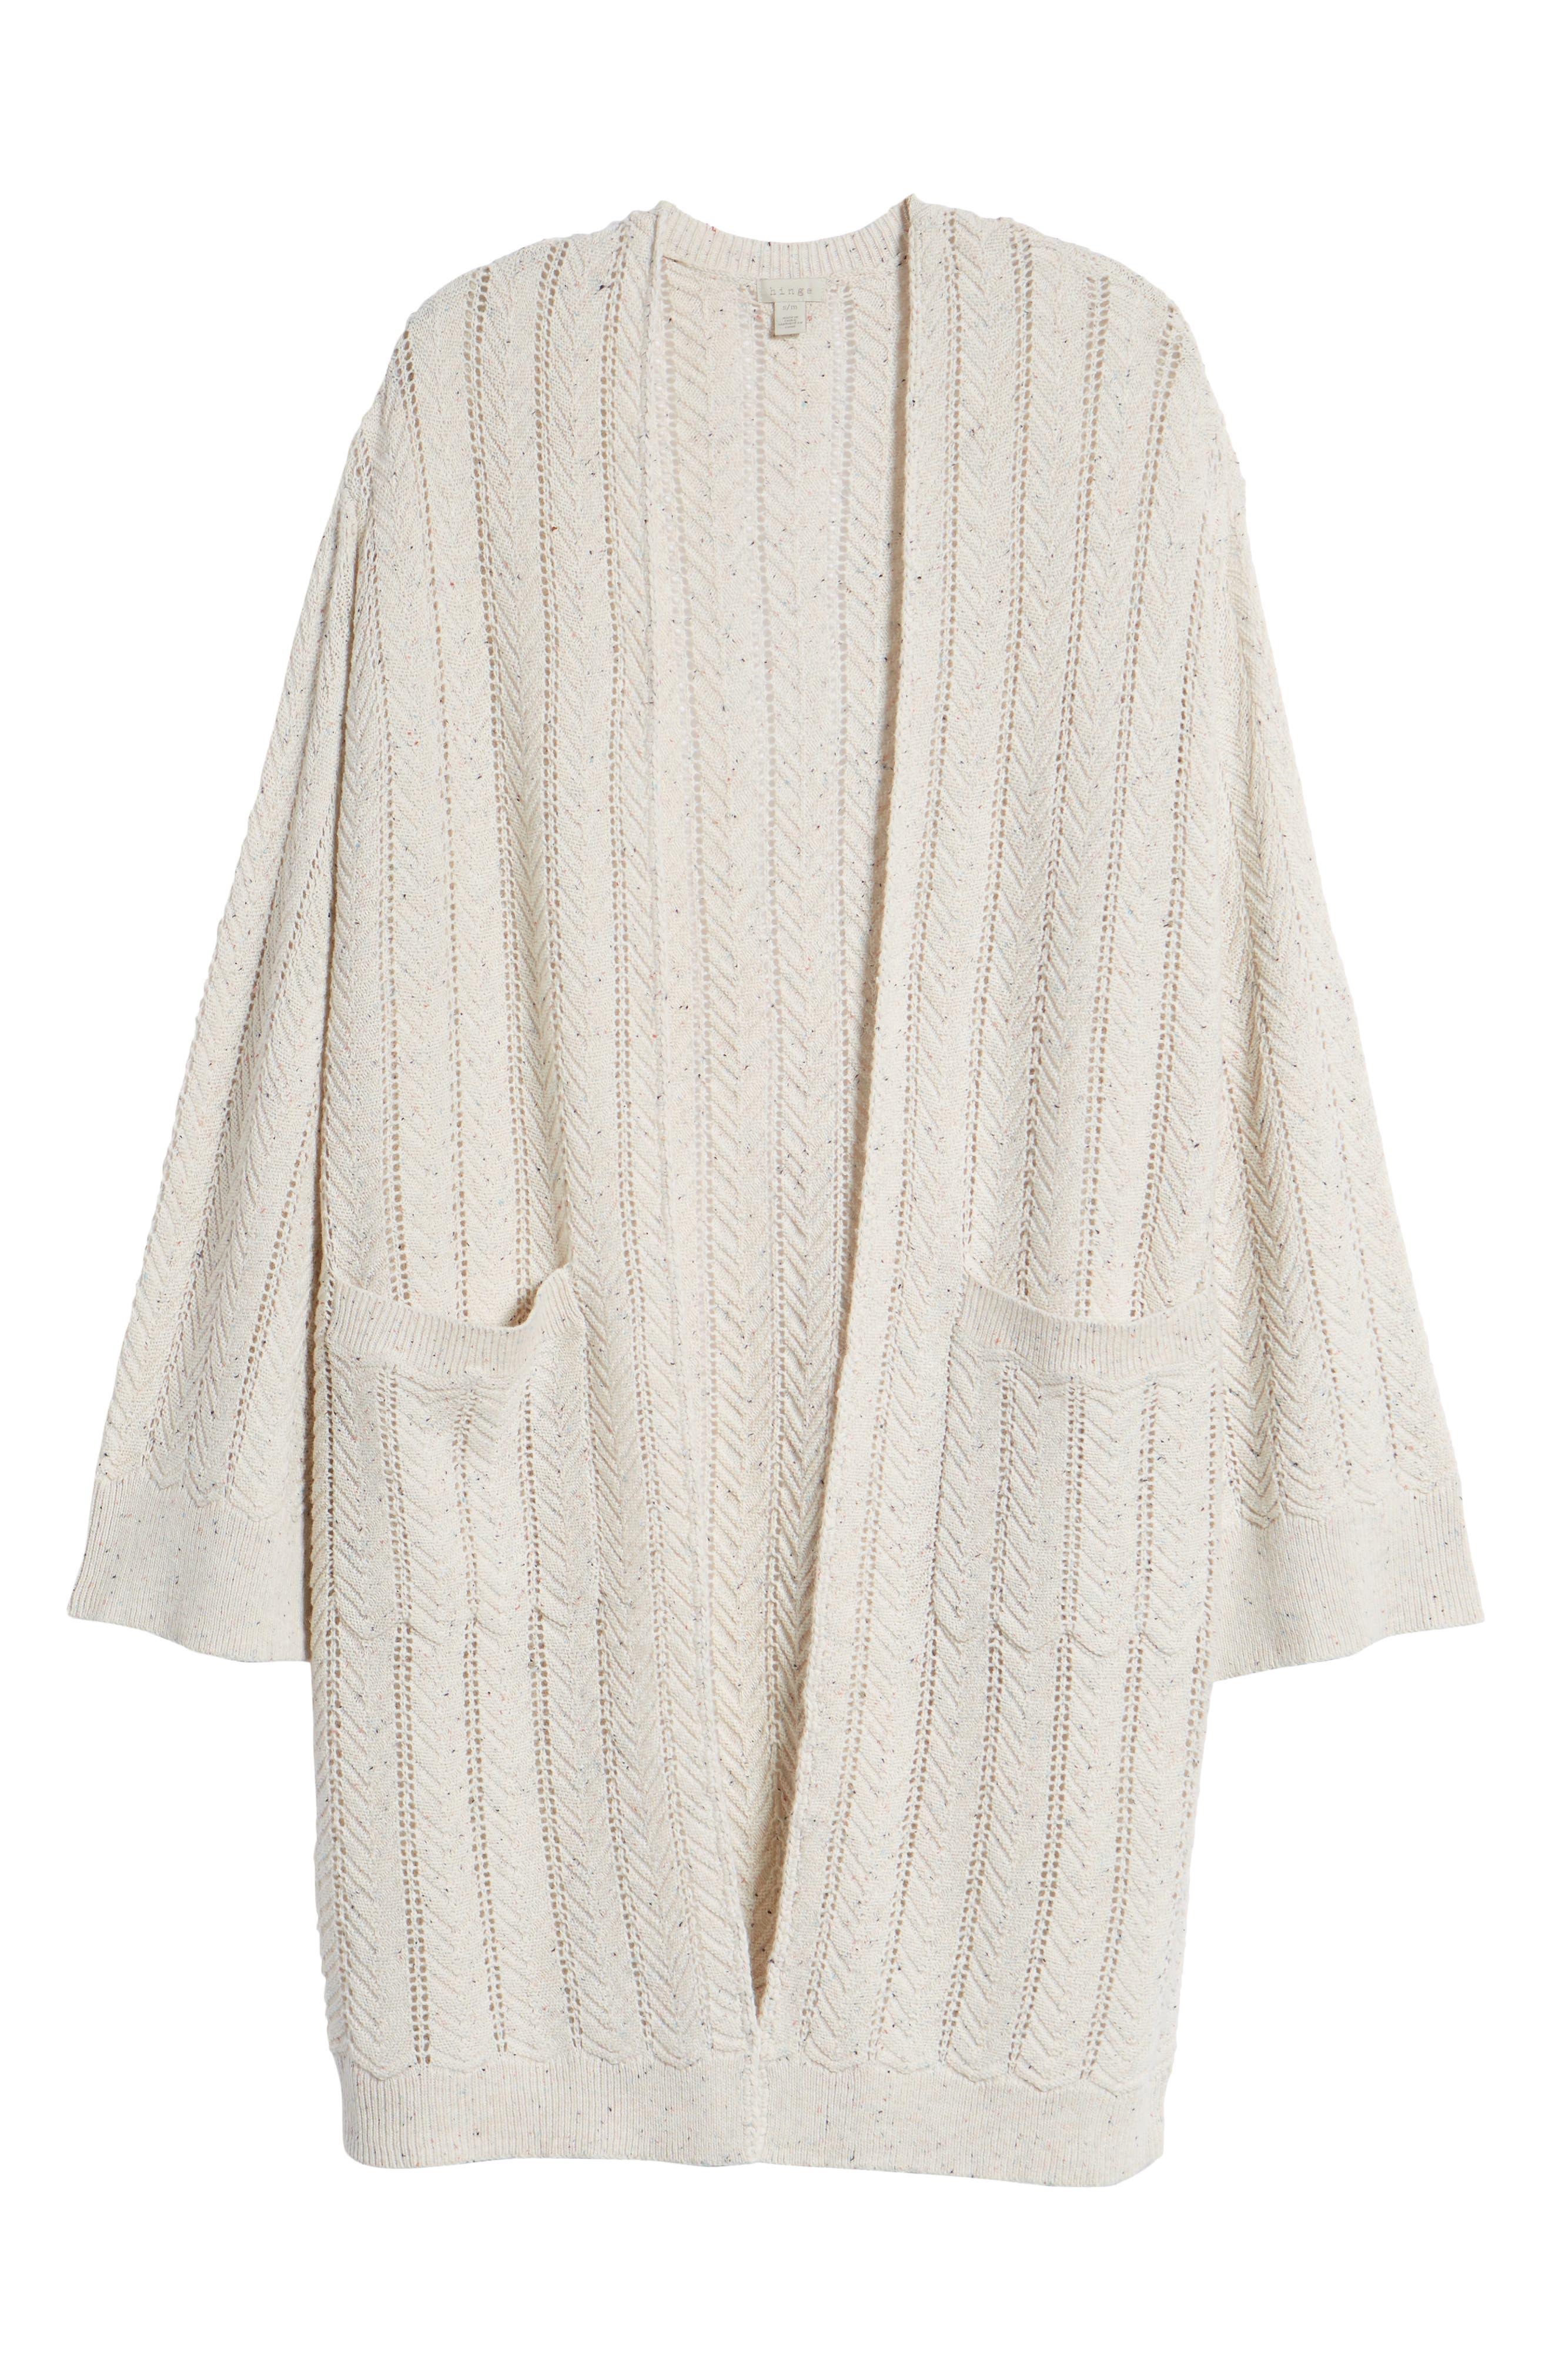 Long Tweed Herringbone Stitch Cardigan,                             Alternate thumbnail 6, color,                             260